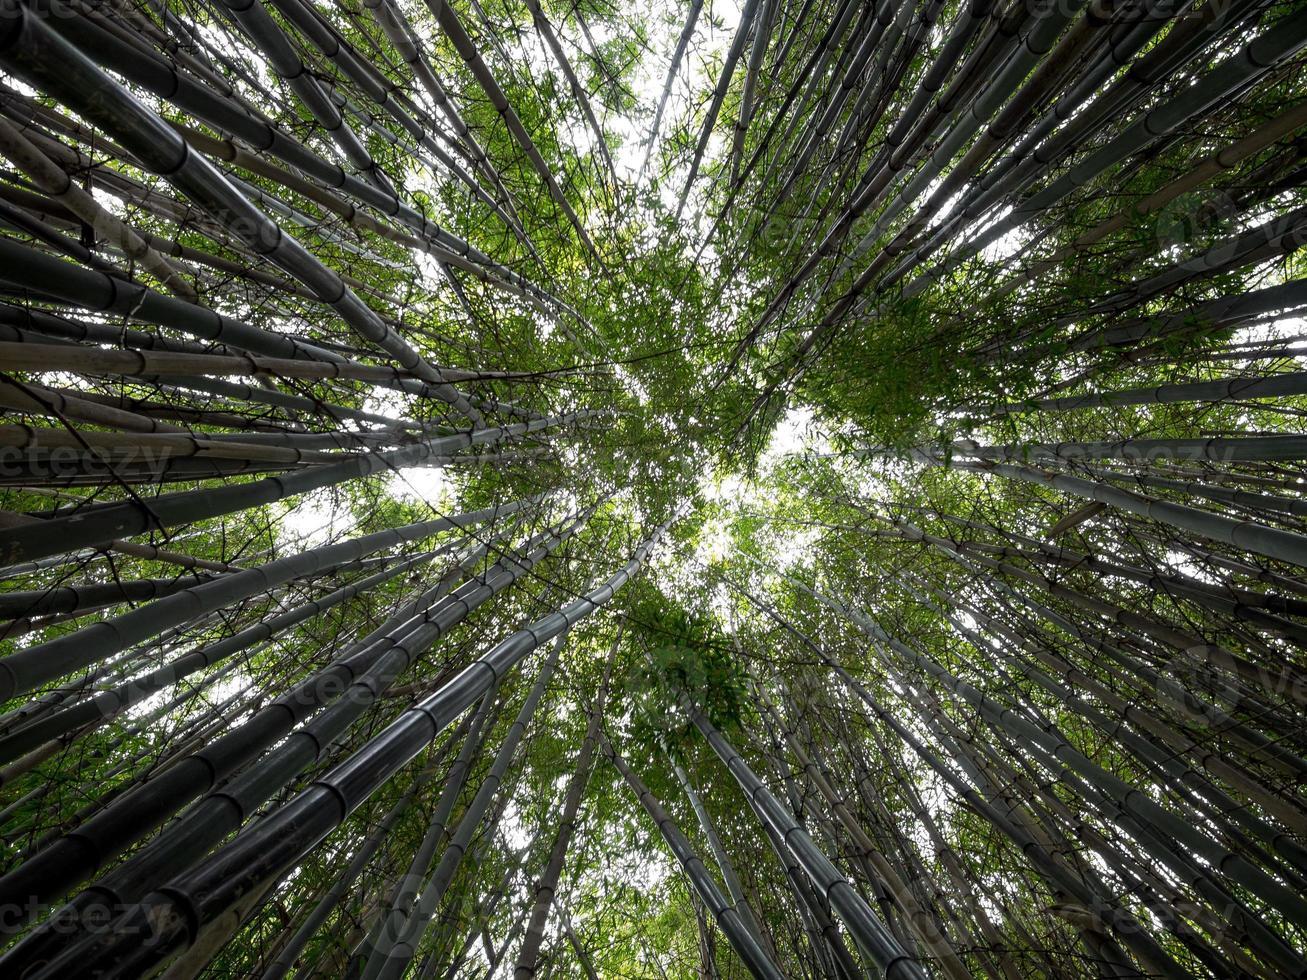 Bamboo Shoots photo